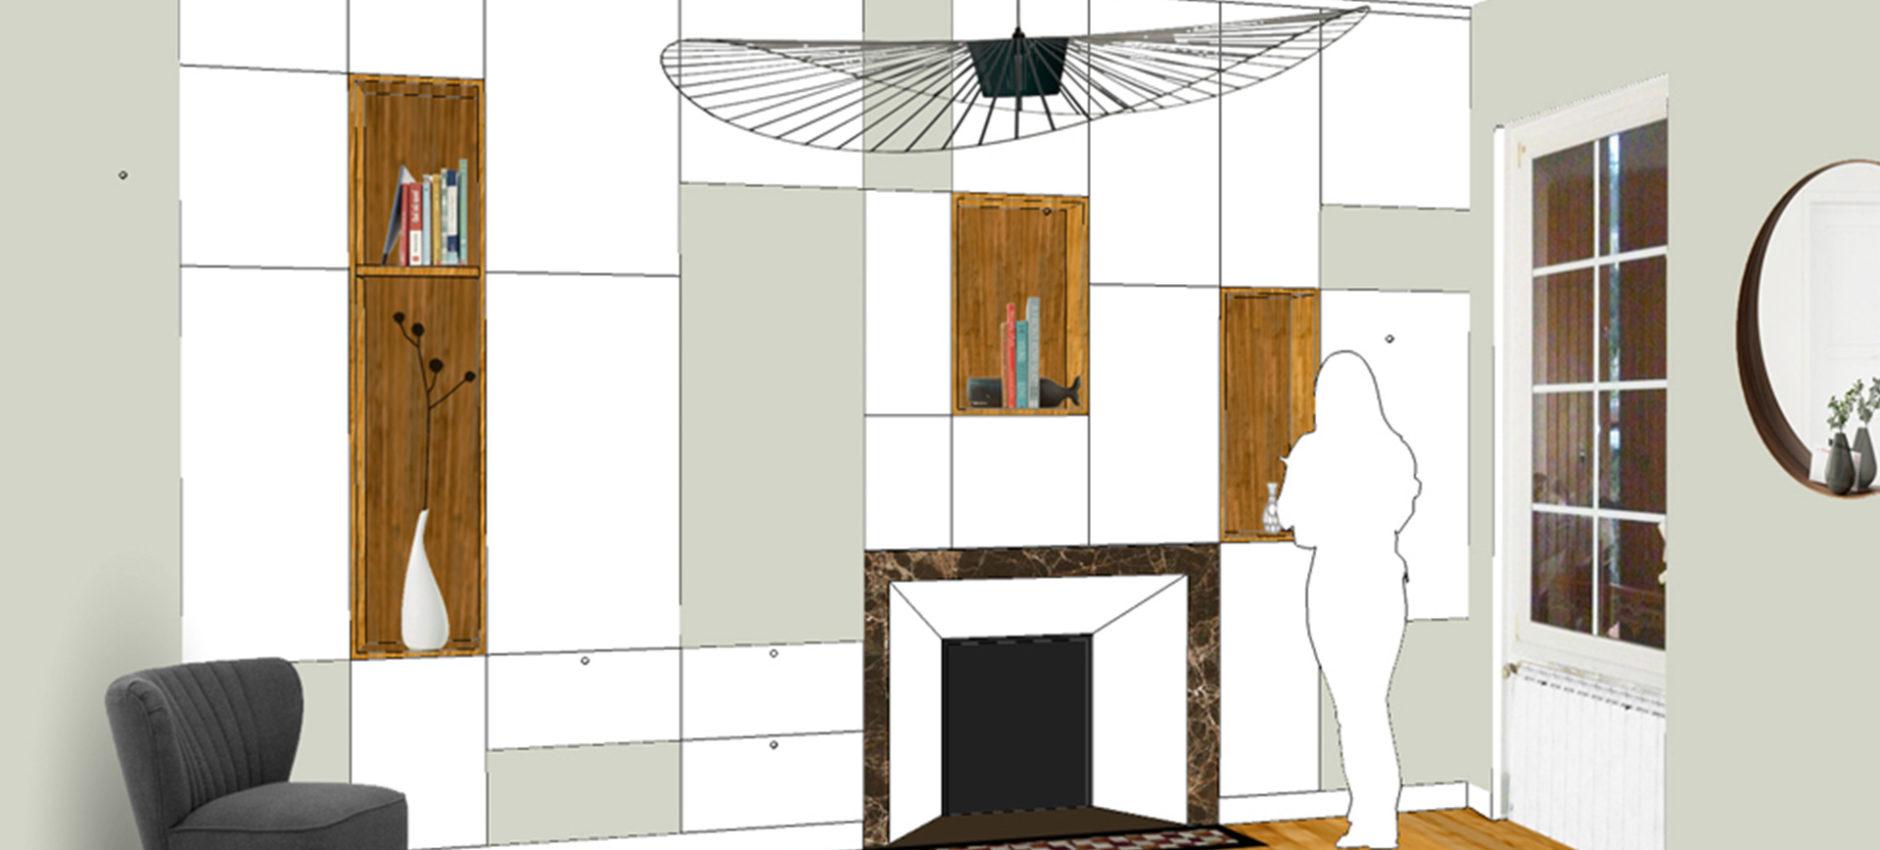 boca_architecture_projet_maison_AG_01.jpg